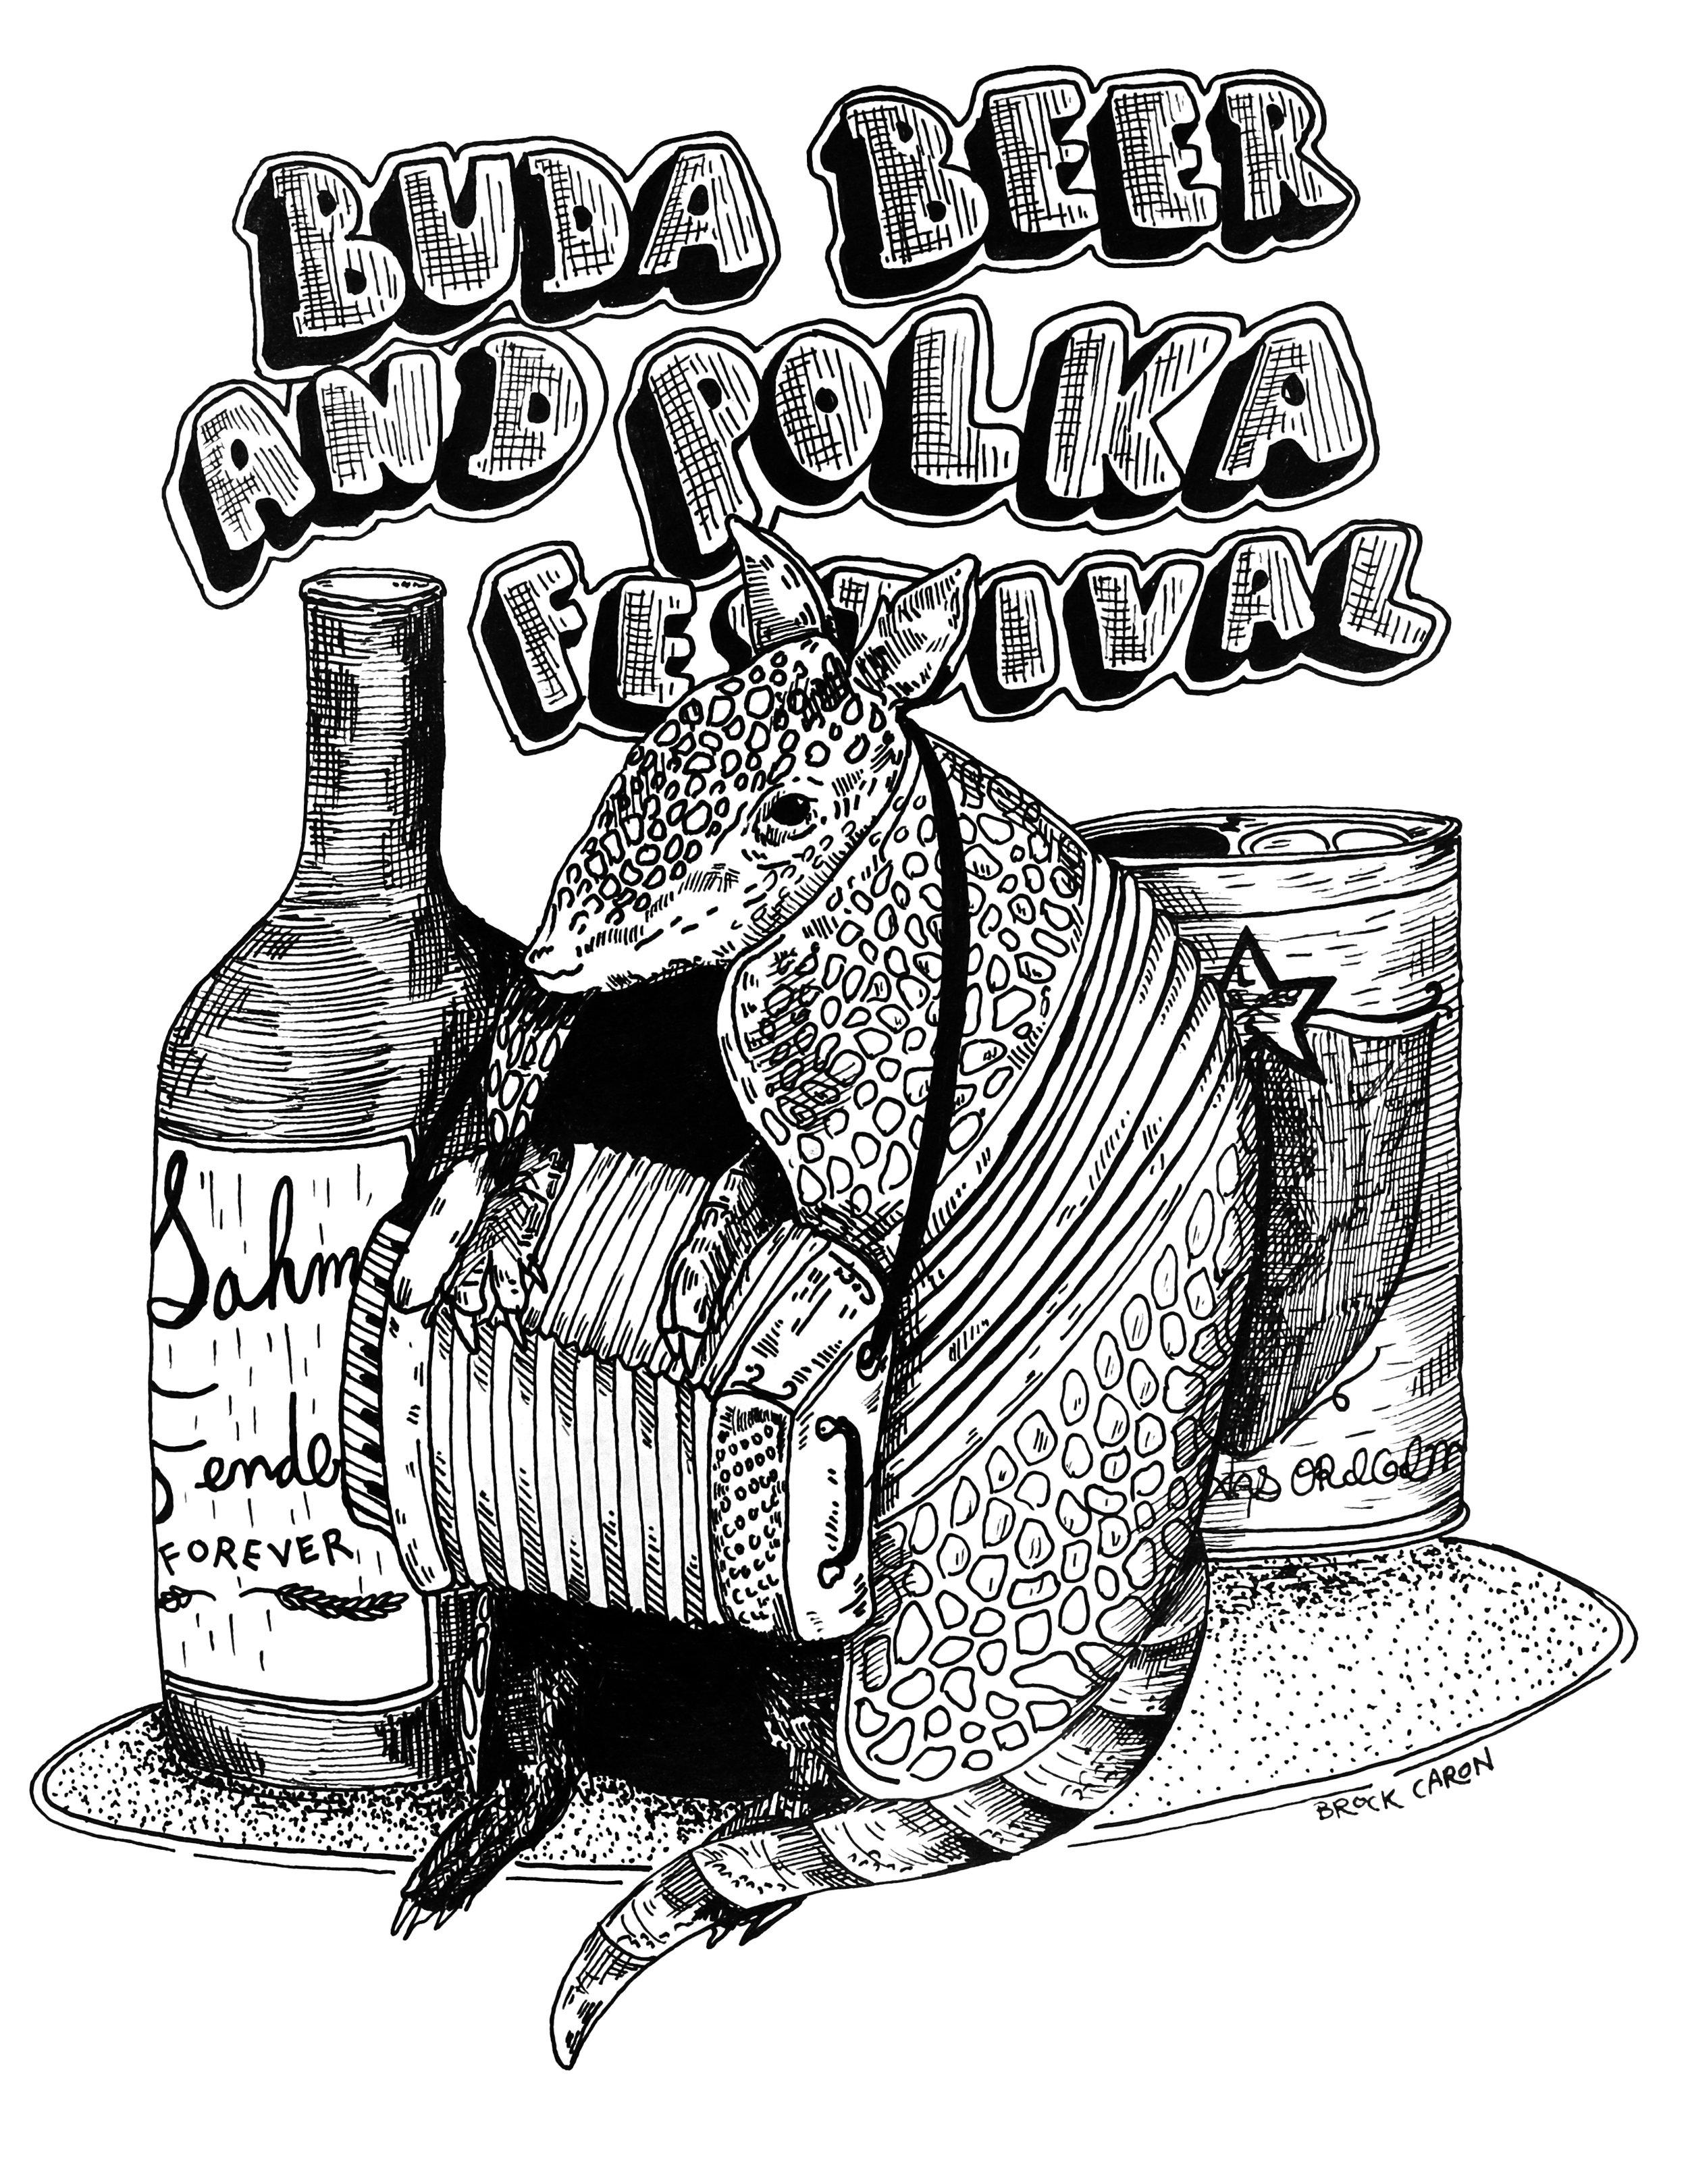 polka festival v2.jpg